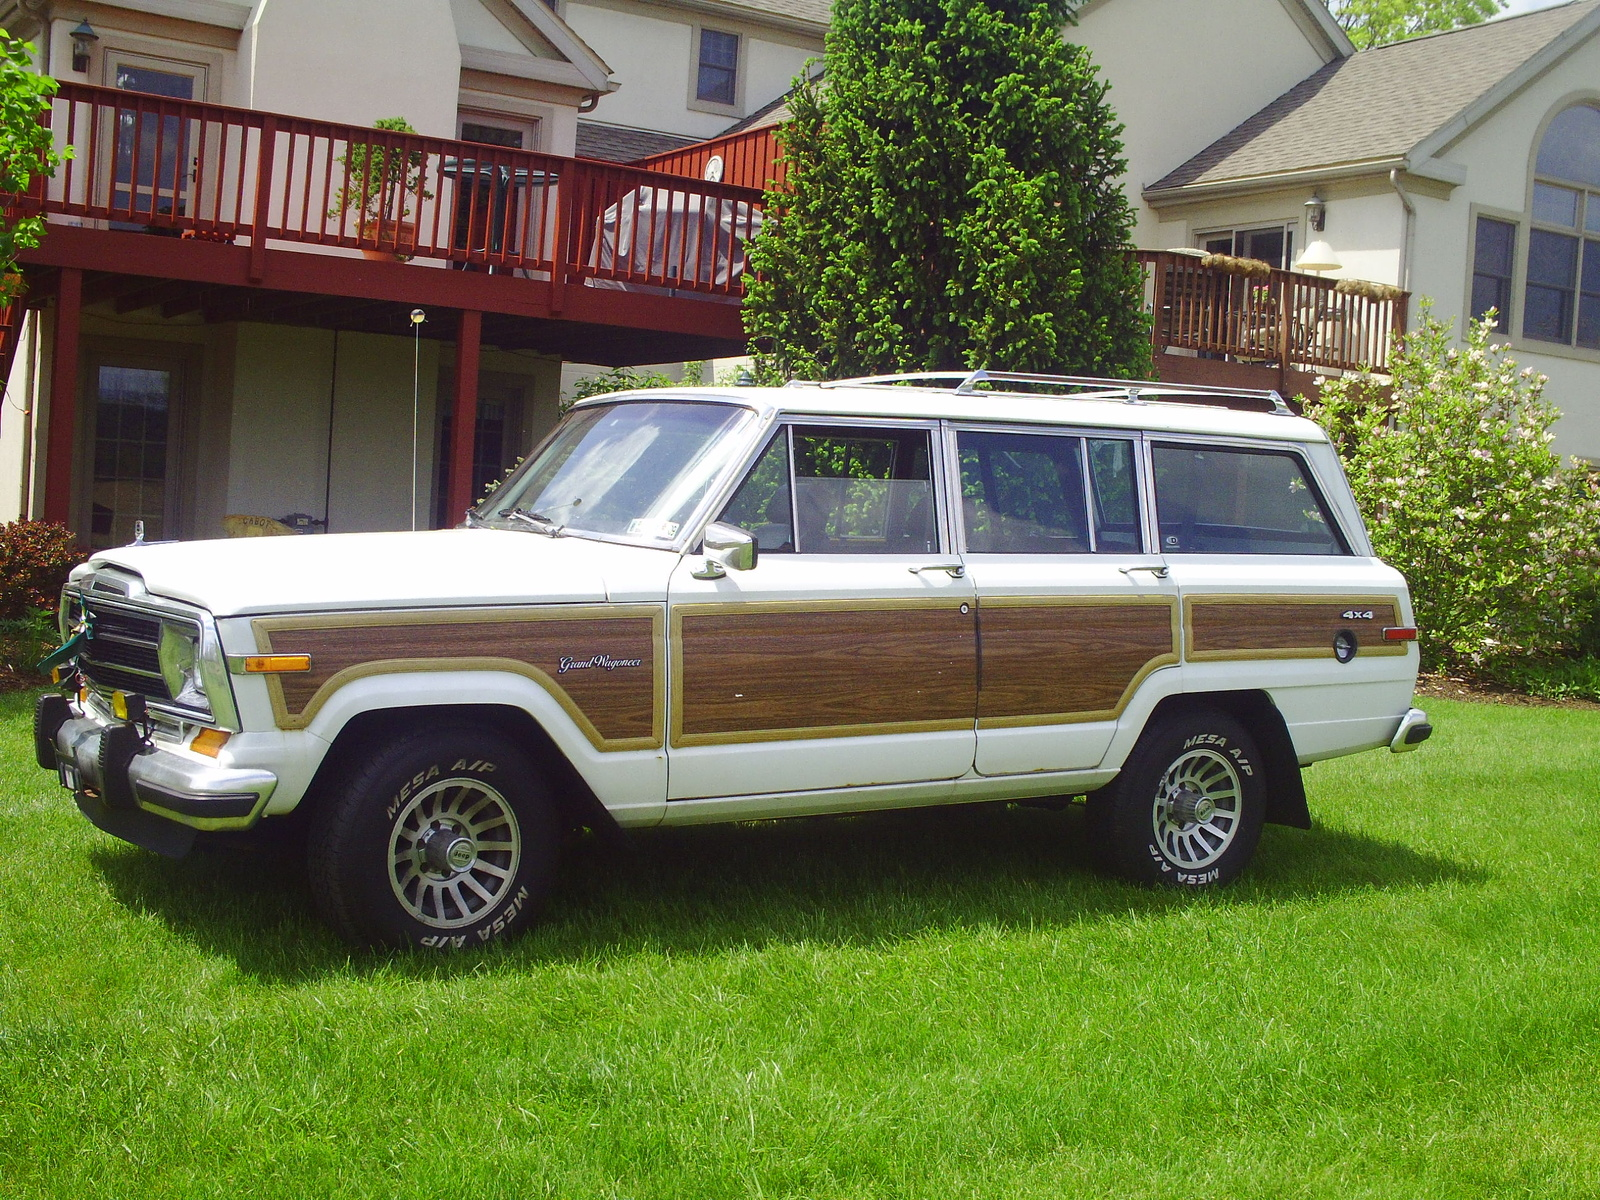 1990 Jeep Grand Wagoneer #9 Jeep Grand Wagoneer #9